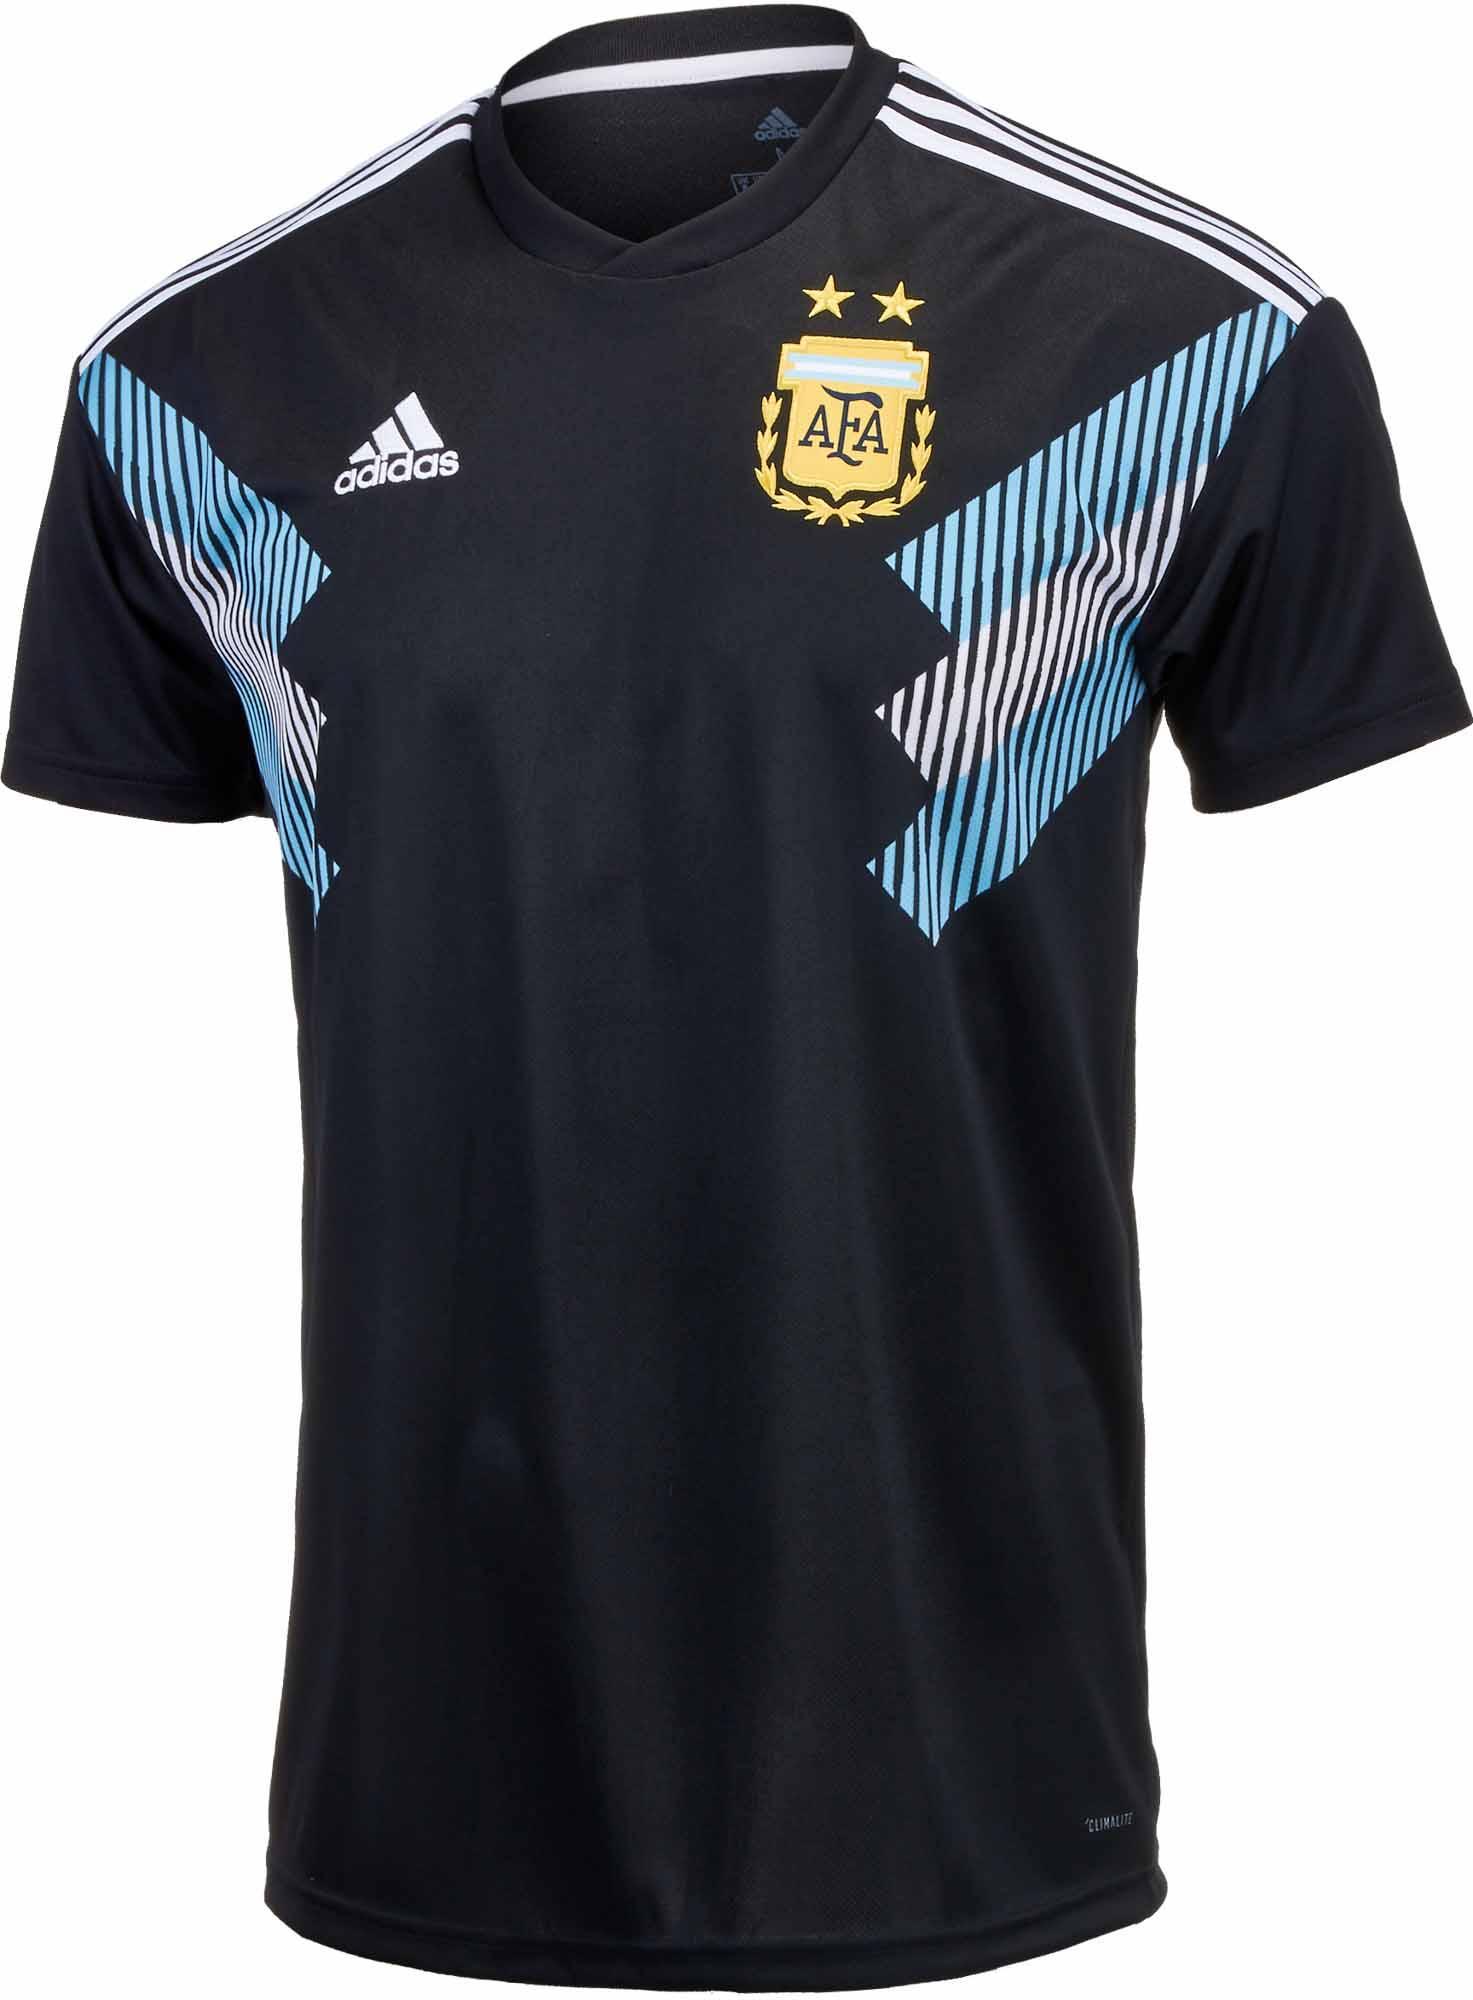 Fitur Jersey Timnas Indonesia Away New Terbaru 2019 Grade A 2018 Bola Argentina World Cup Piala Dunia Baju Laki